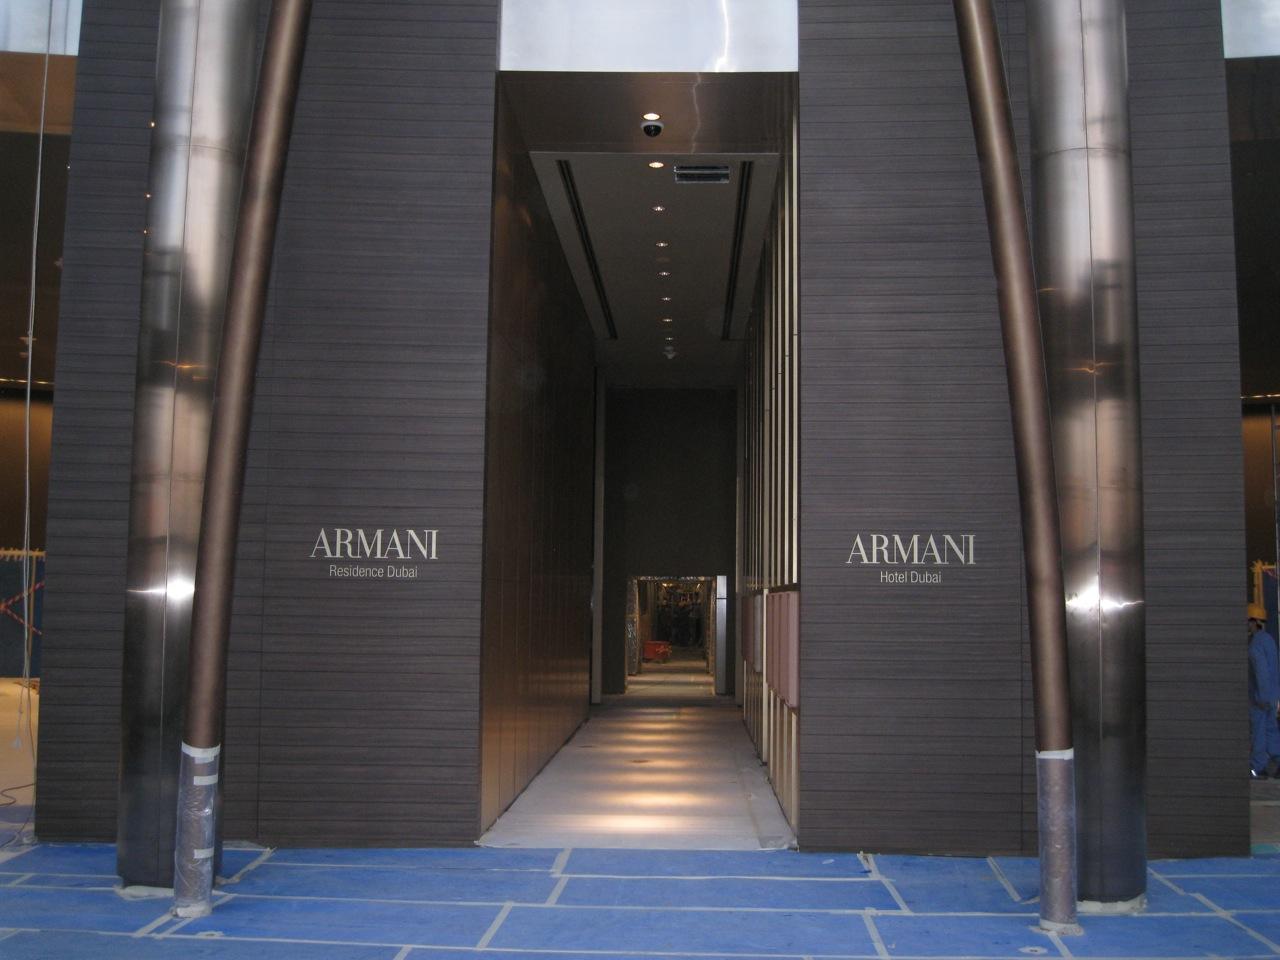 Dubai armani hotel velvet palette Armani hotel in burj khalifa